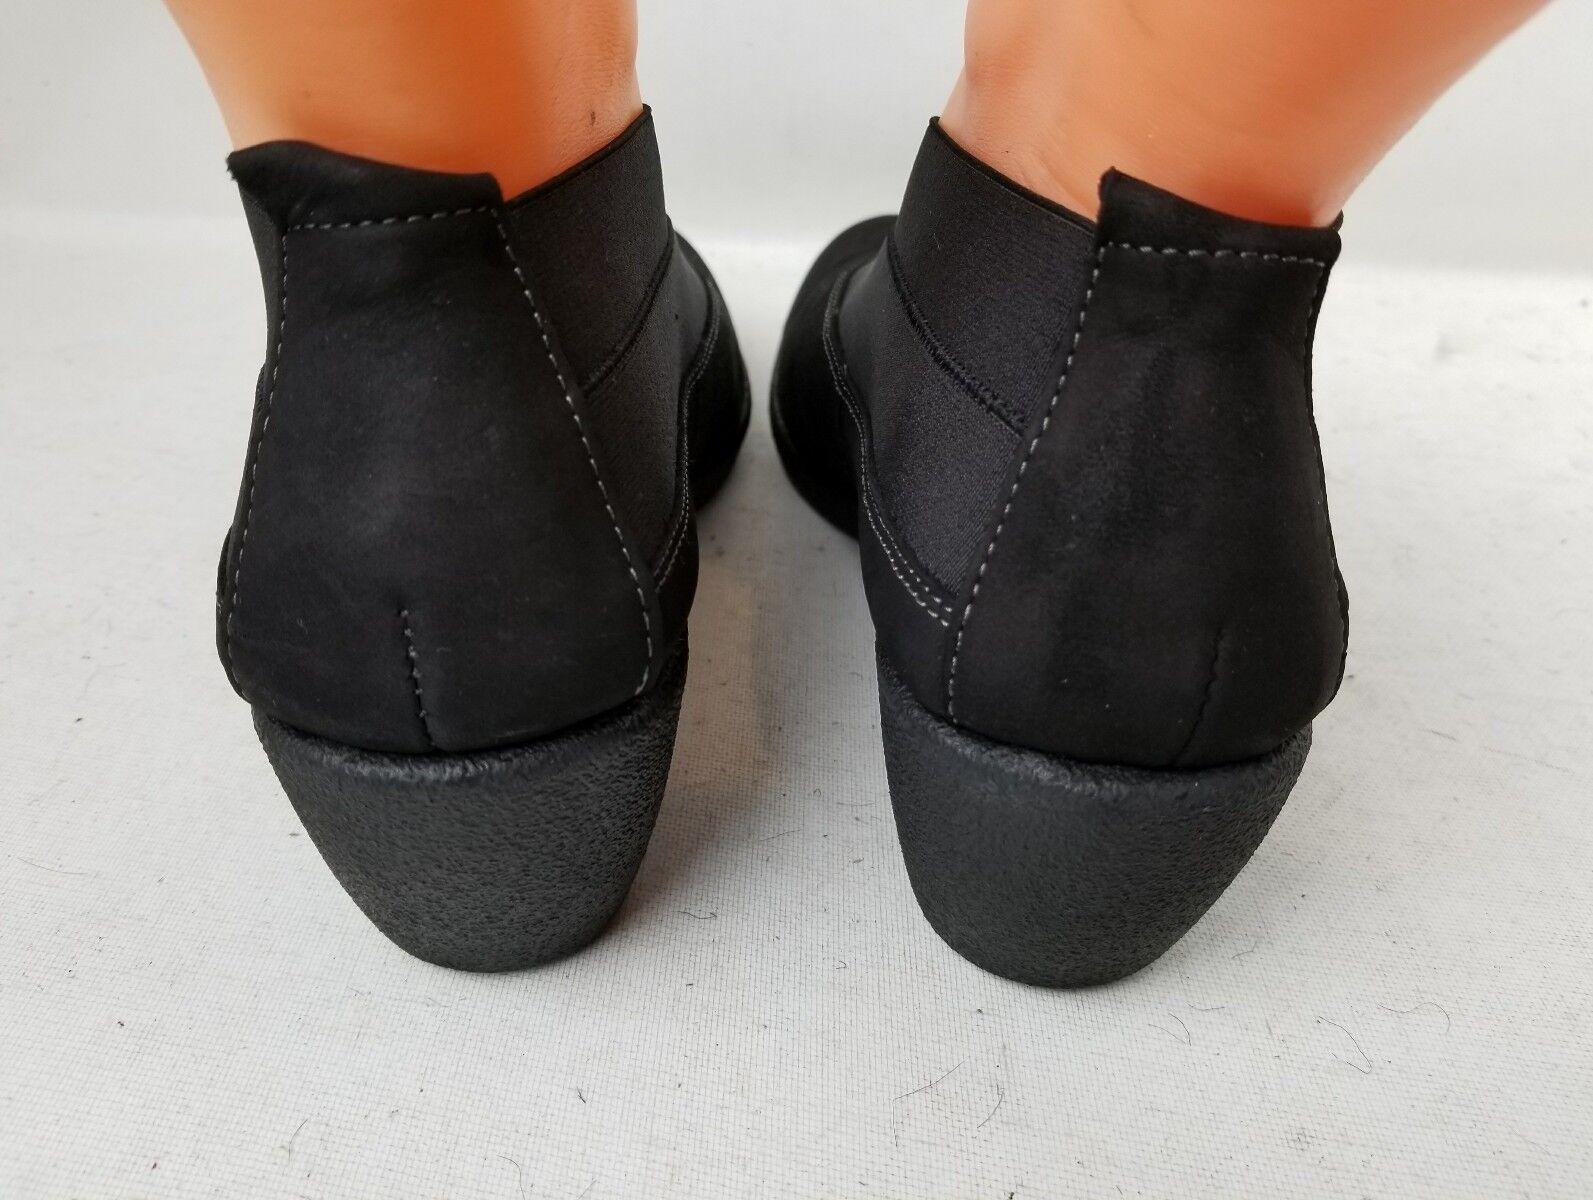 THE MOCCASIN FLEXX Damenschuhe STRETCH RUN MOCCASIN THE COMFORT ATHLETIC WORK Schuhe SZ EU 42 US 10 5dc417